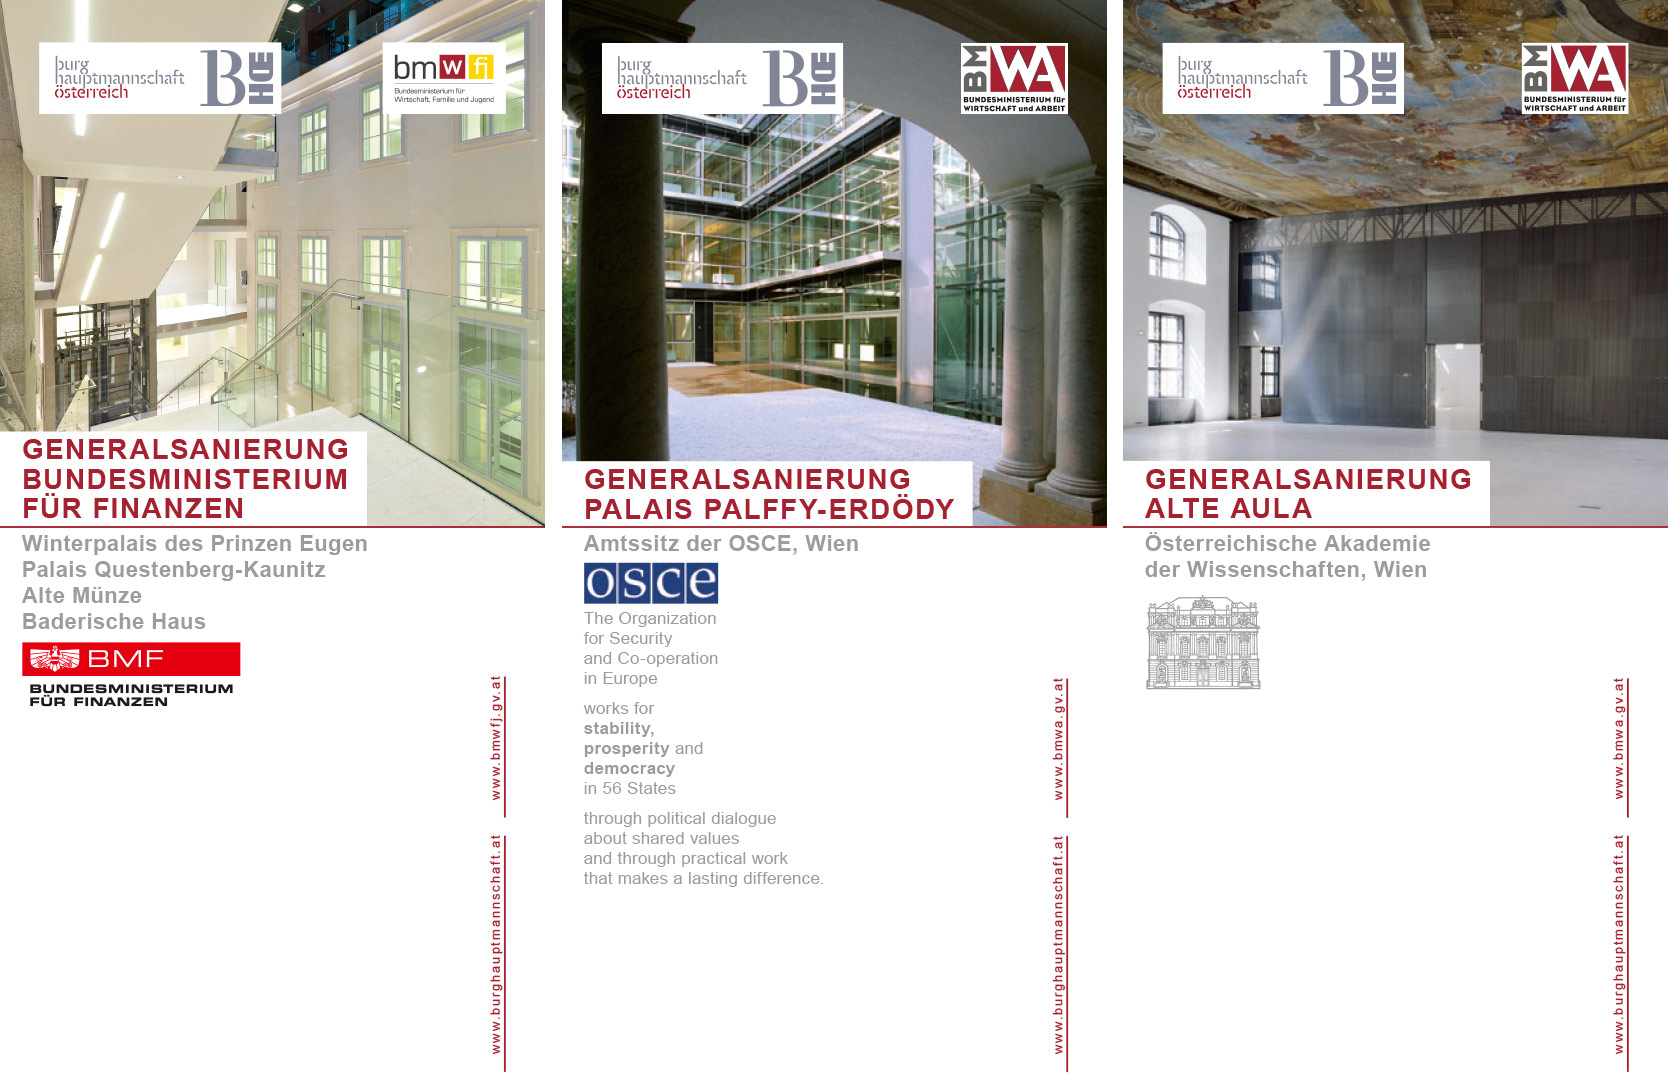 Burghauptmannschaft Österreich Folder 2007-2006